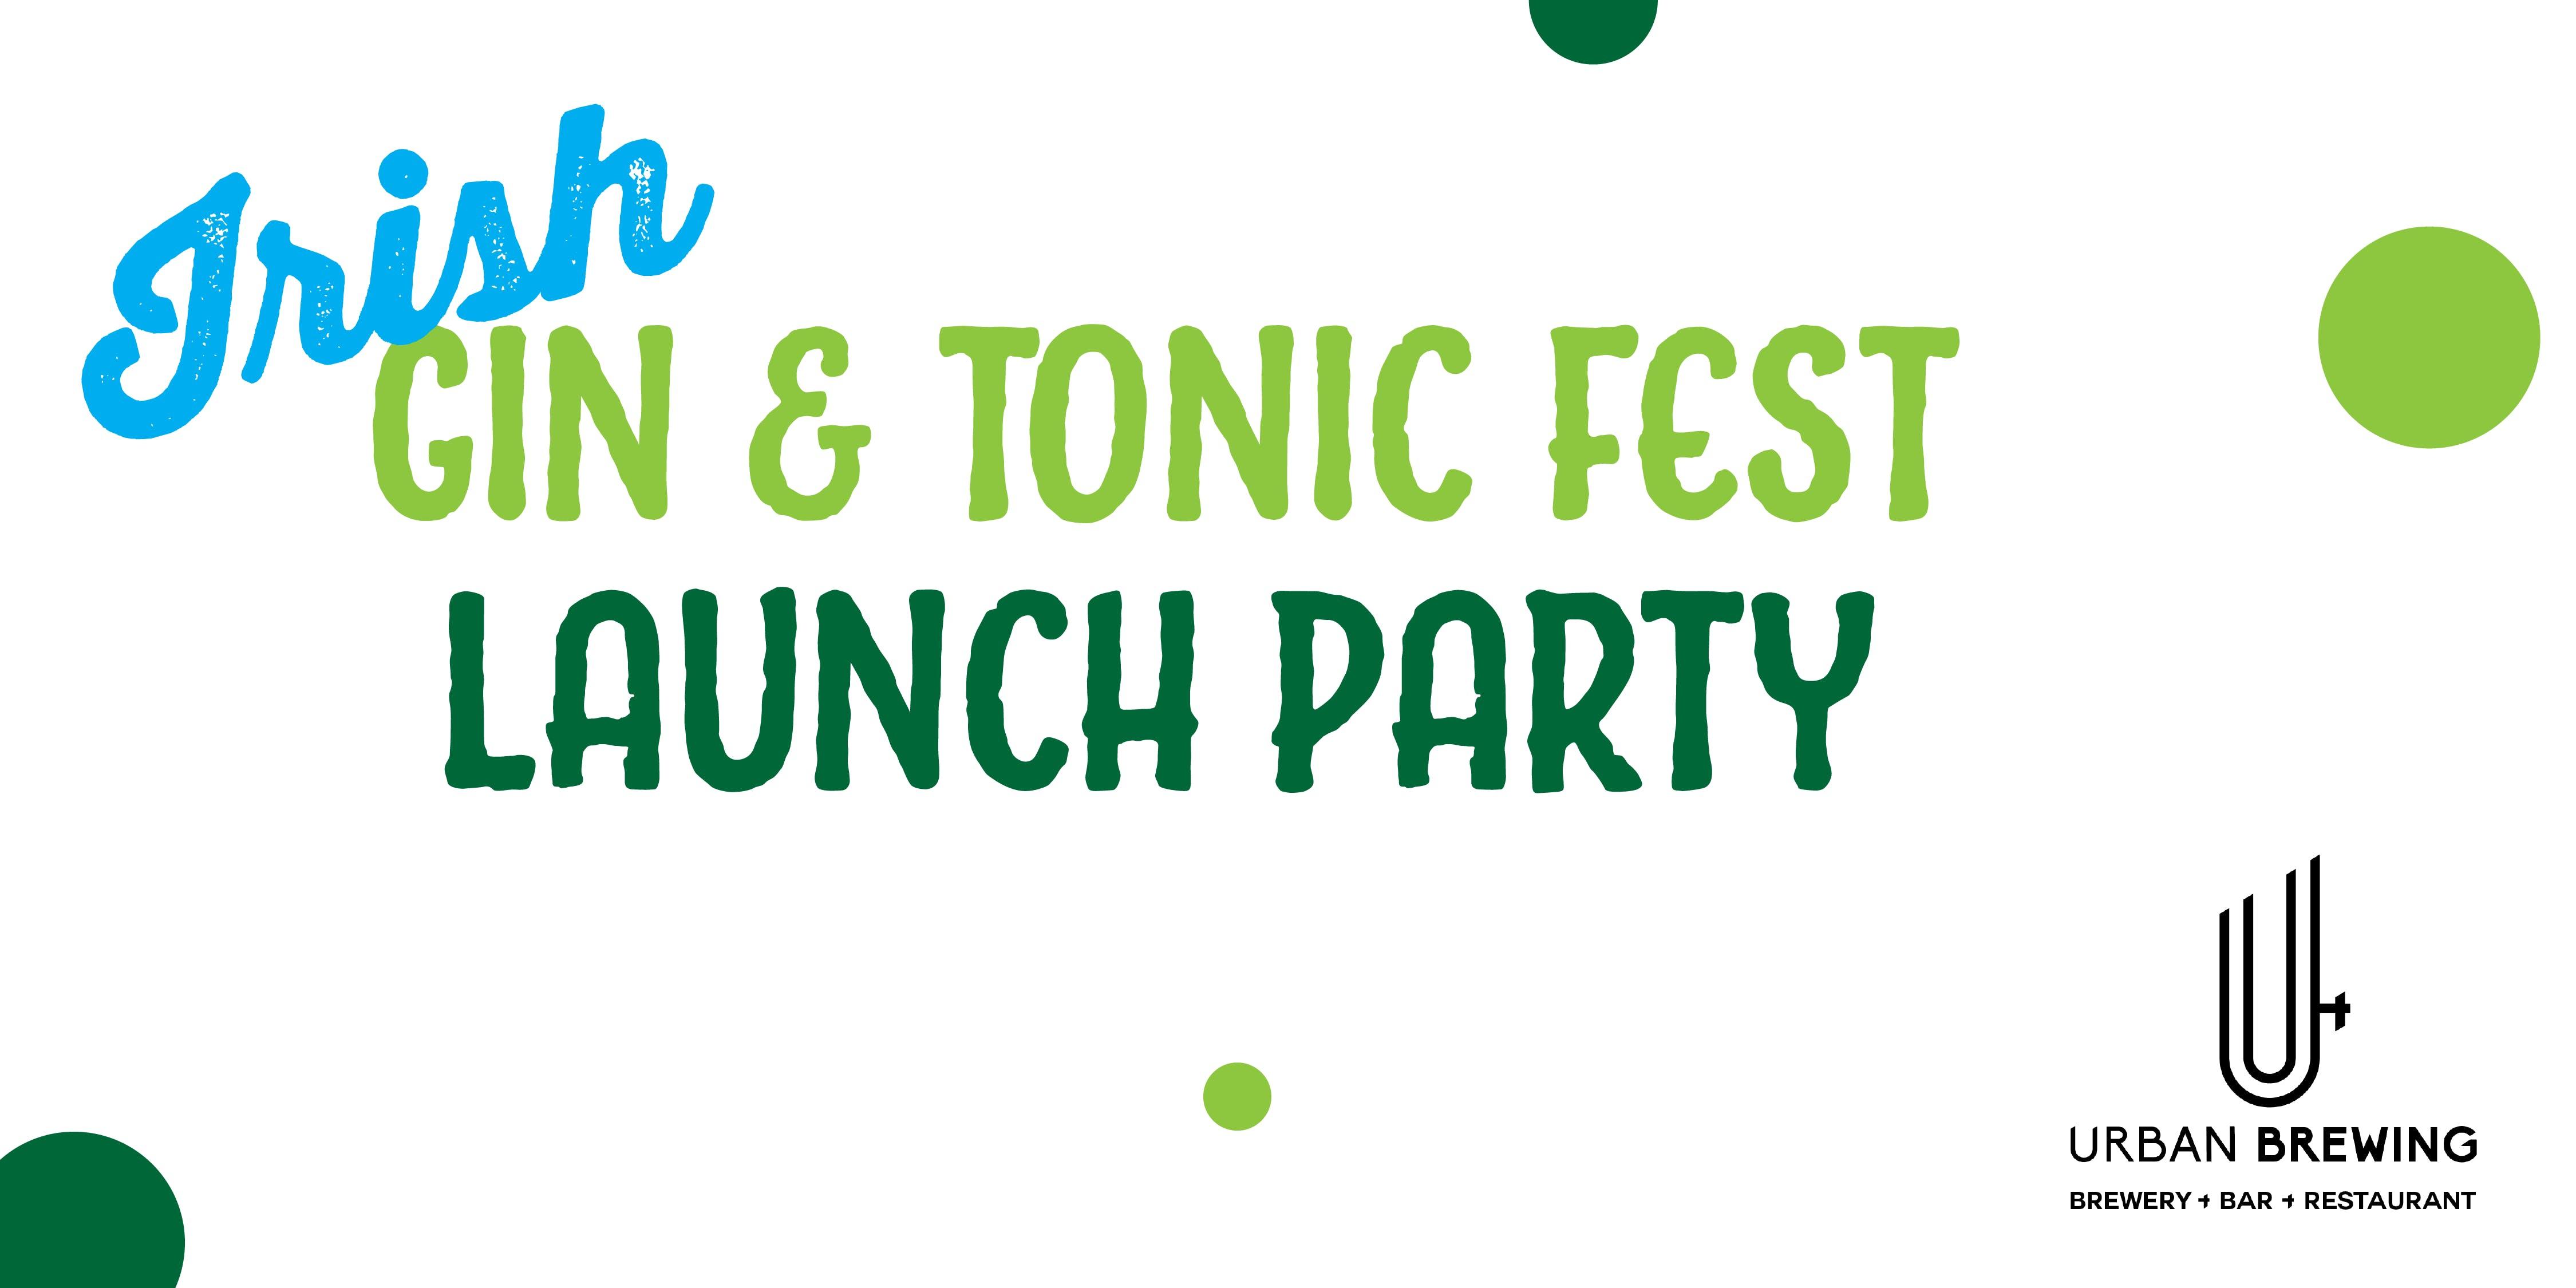 Irish Gin &amp Tonic Fest - Launch Party 1.30pm-3.30pm